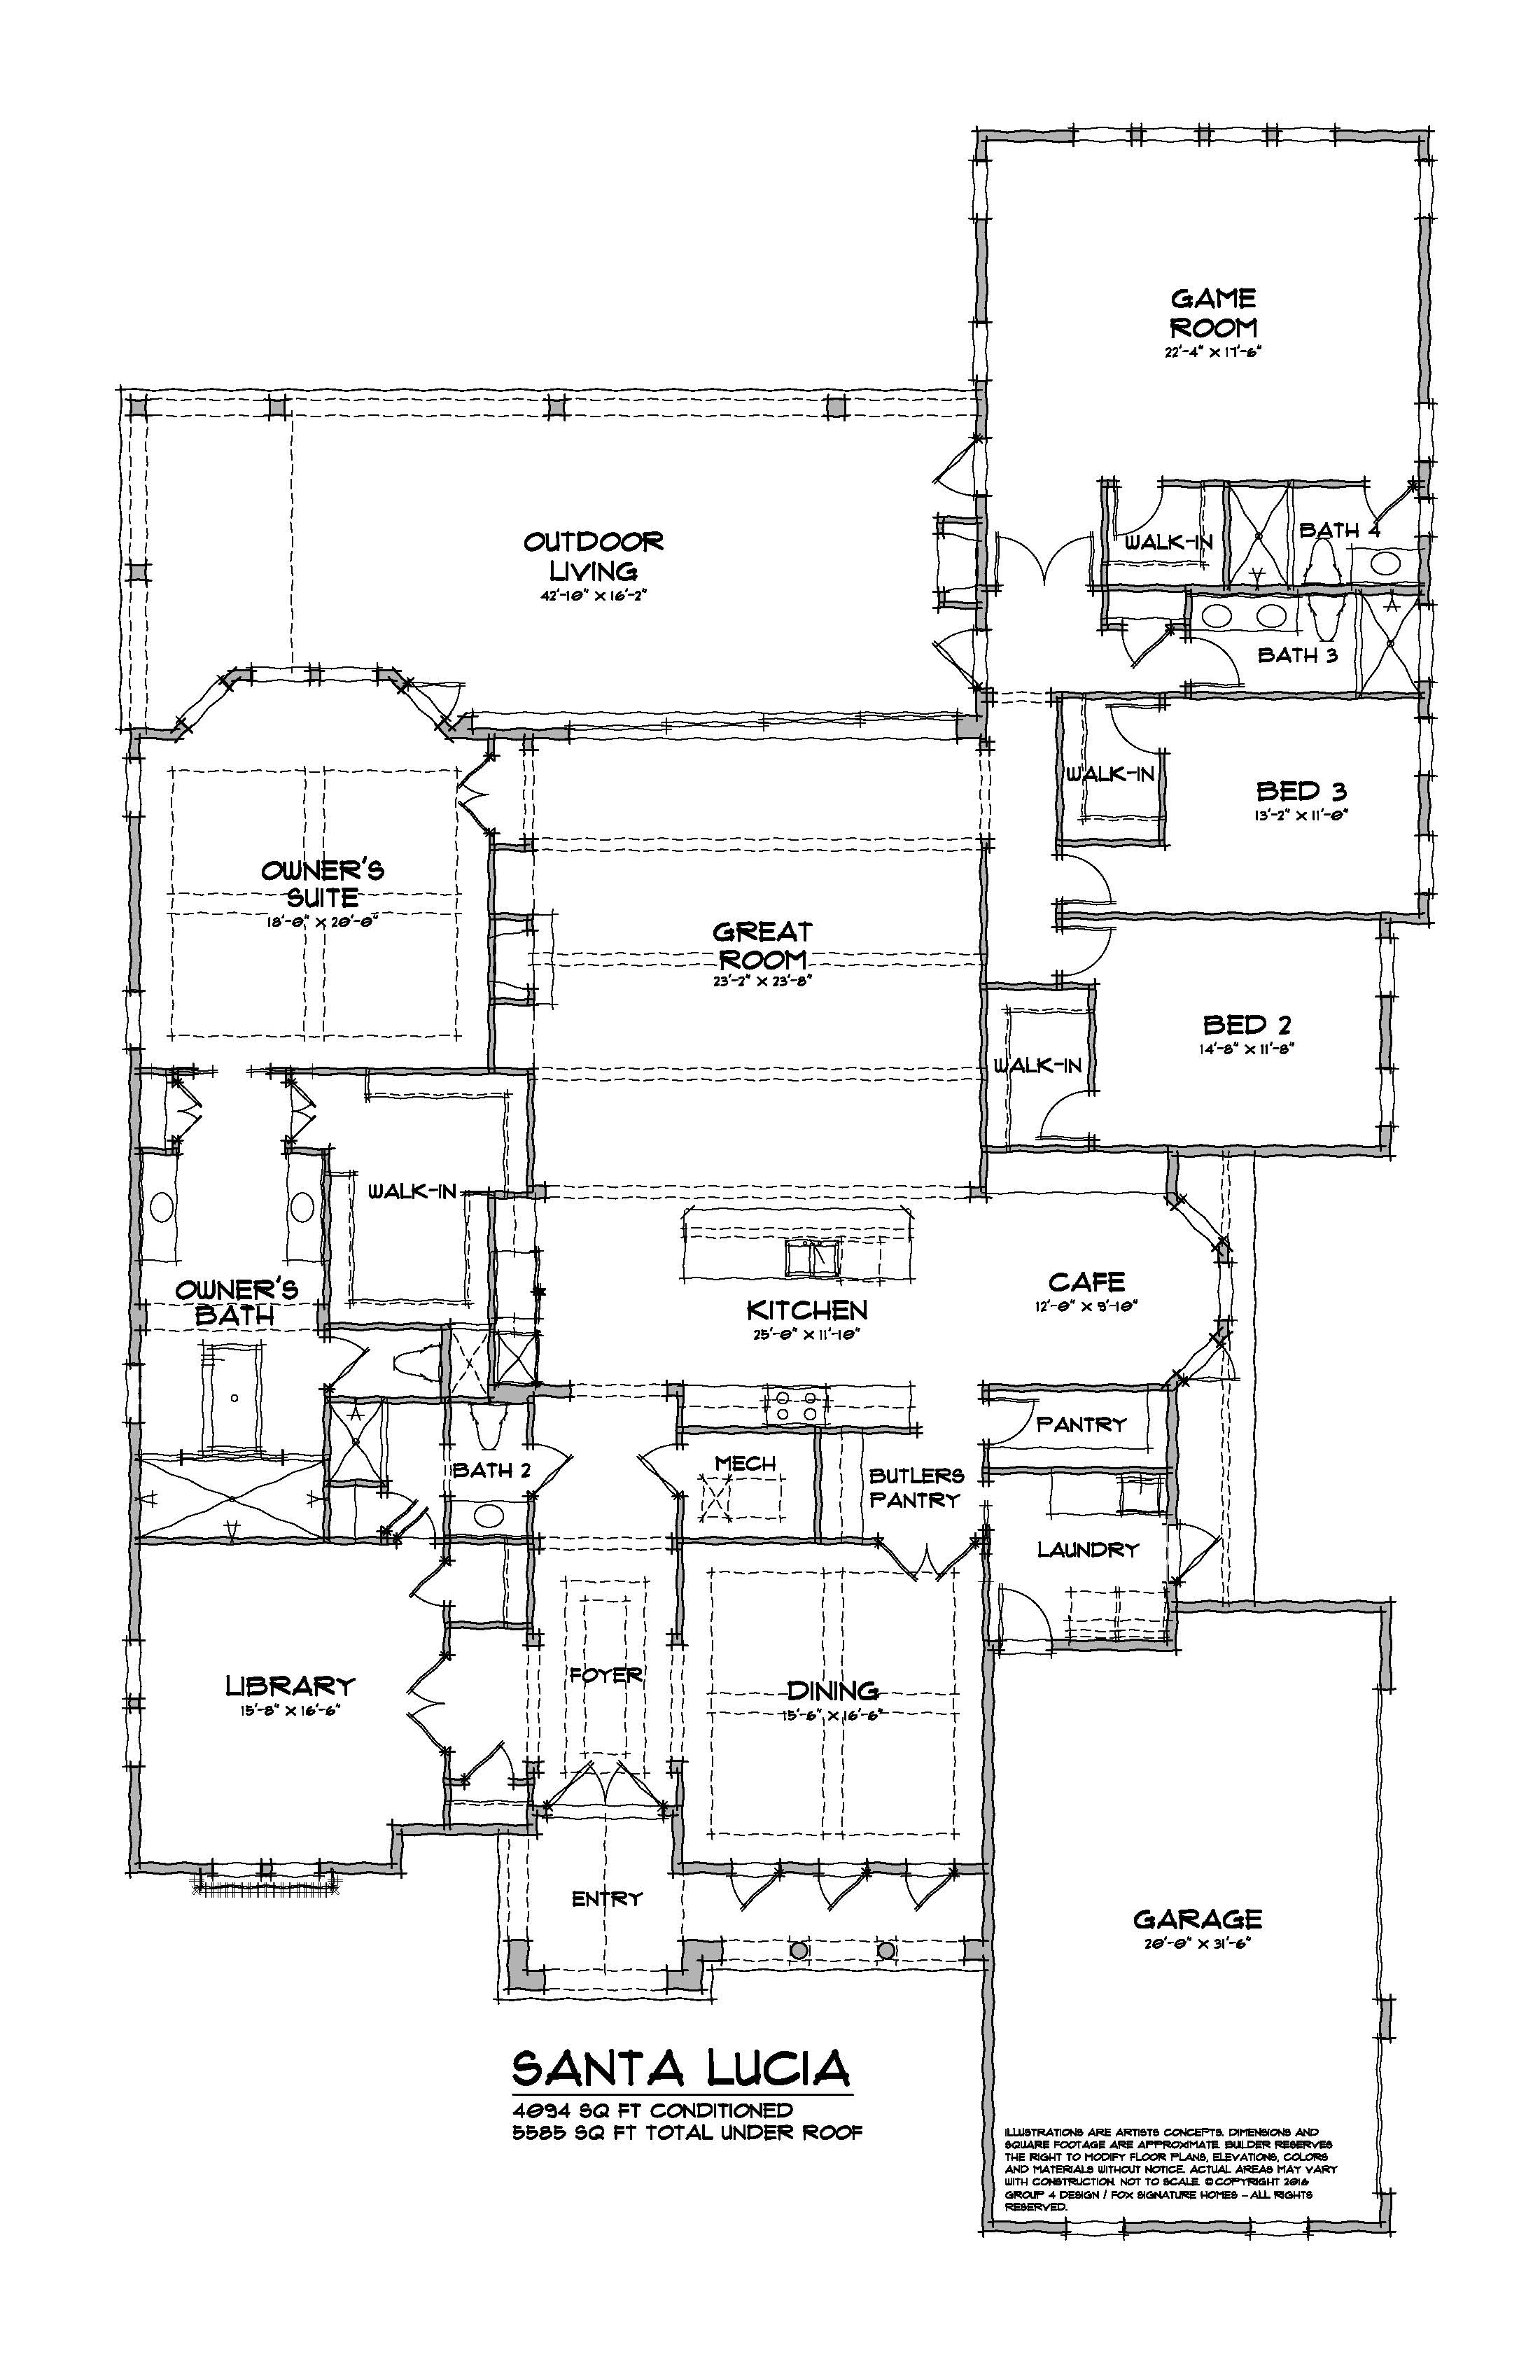 Santa Lucia Floorplan.jpg